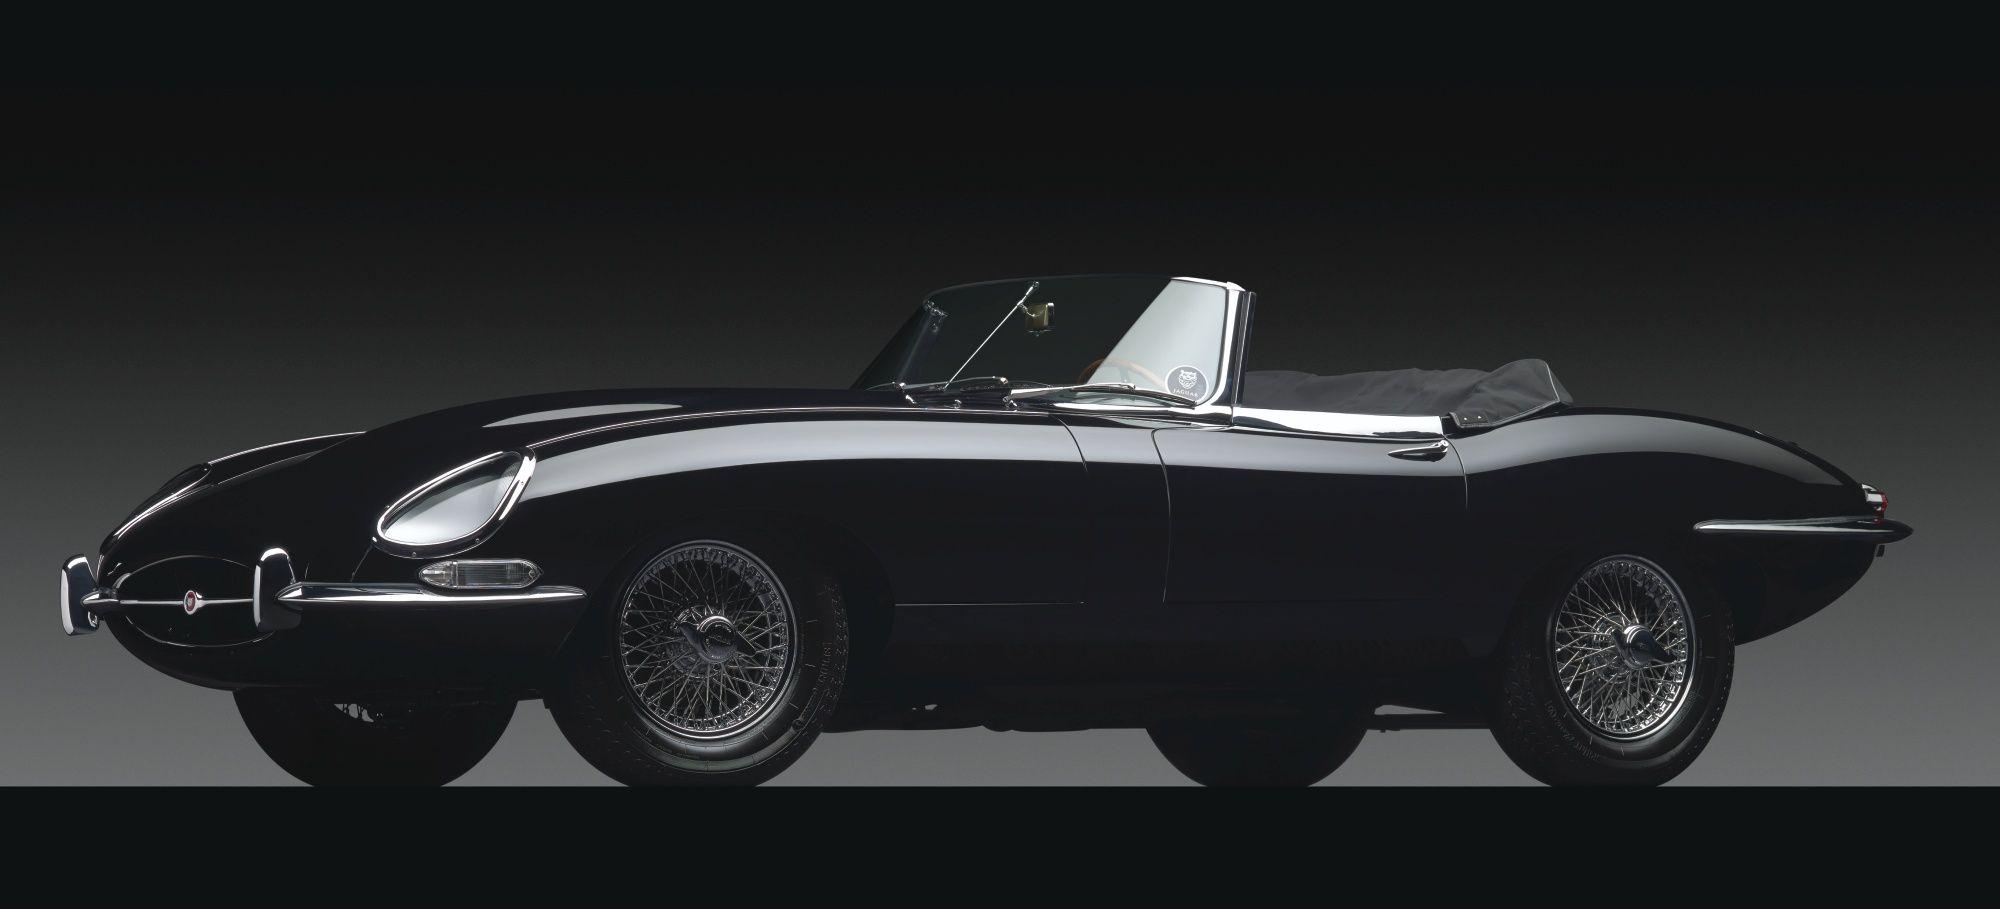 E Type Series I 4 2 Litre Roa Automobile Sotheby S